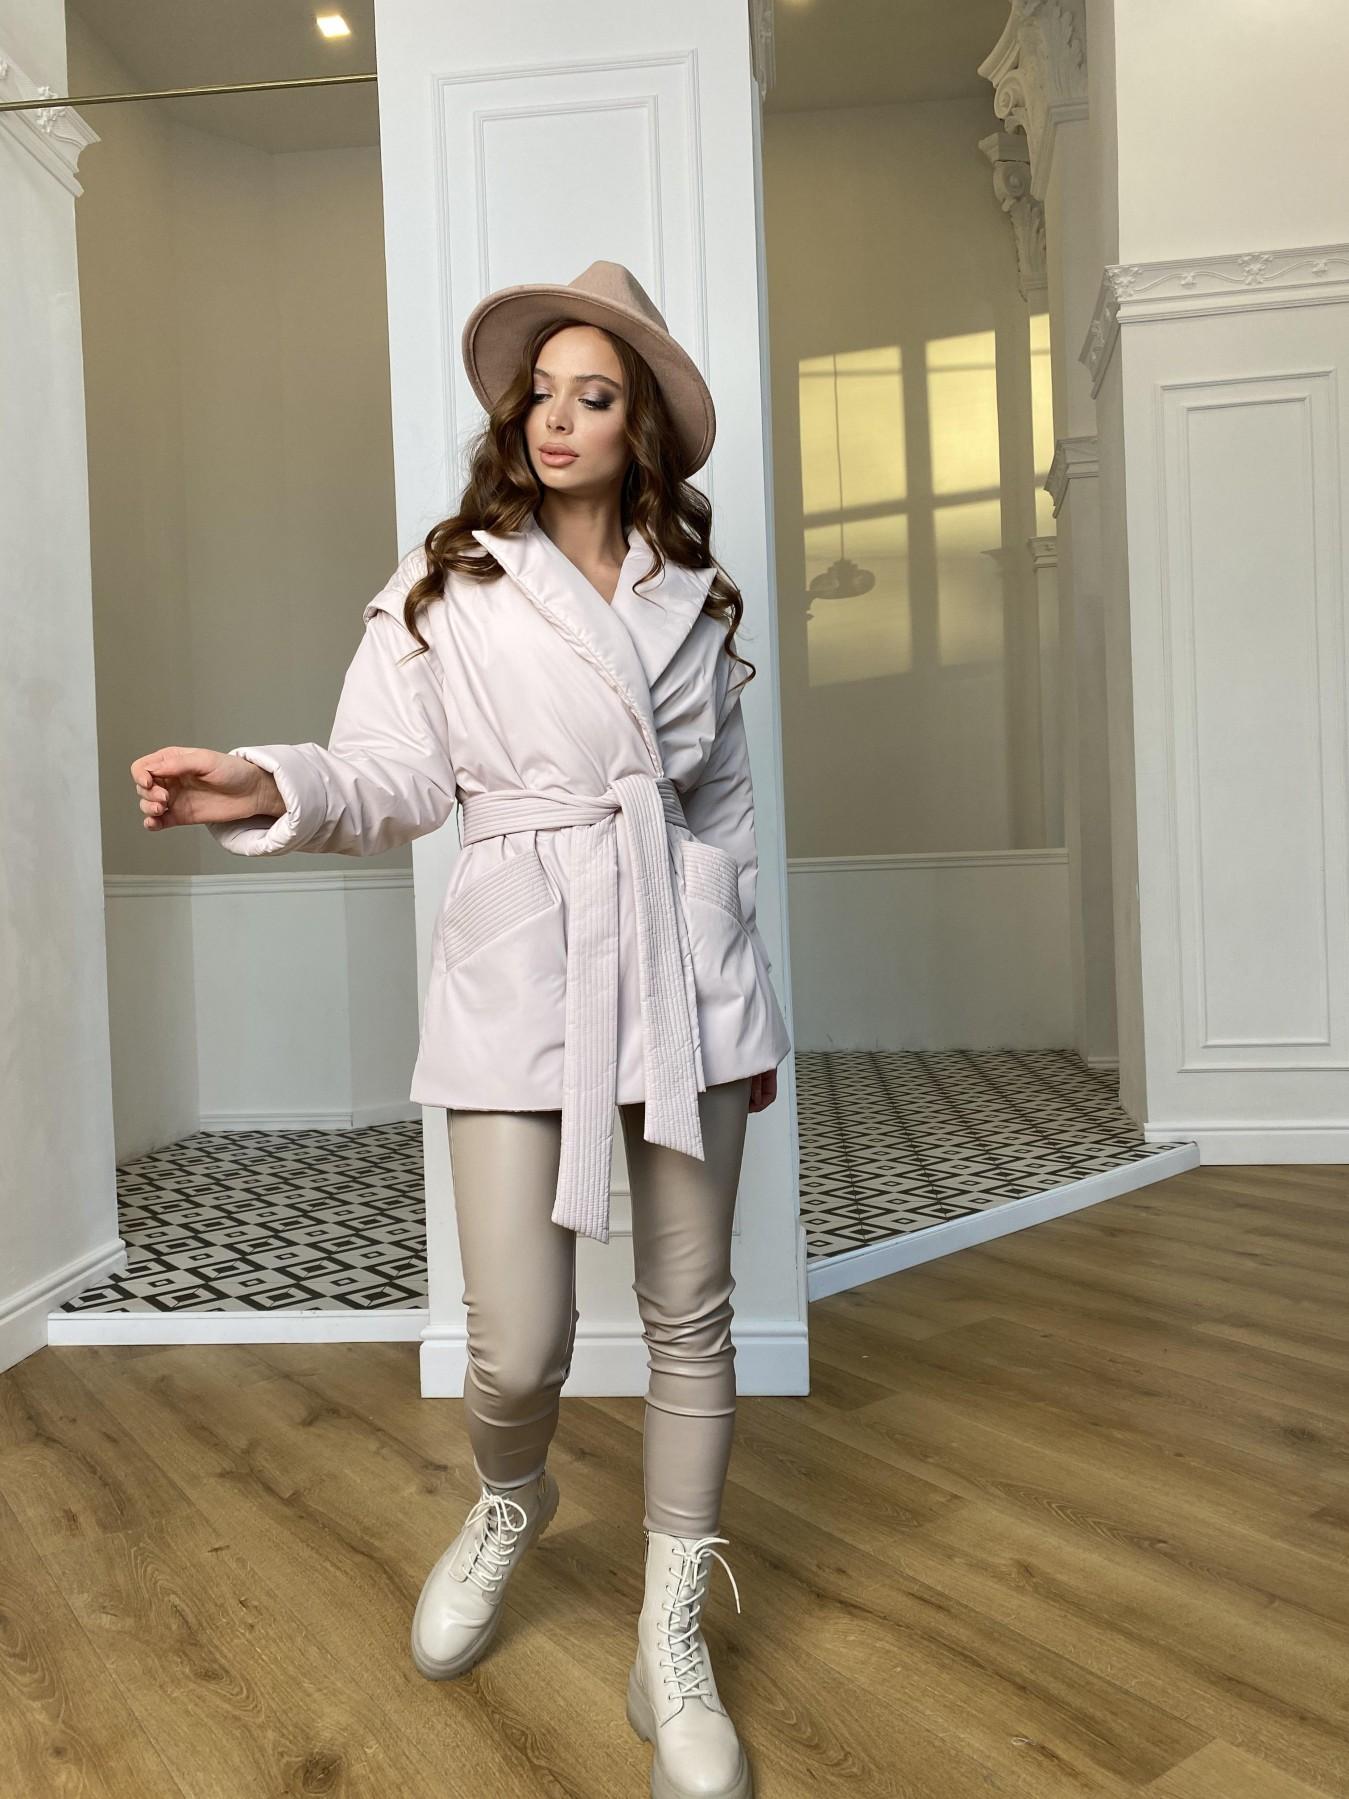 Форбс плащевка Ammy куртка 10817 АРТ. 47298 Цвет: Молоко - фото 8, интернет магазин tm-modus.ru